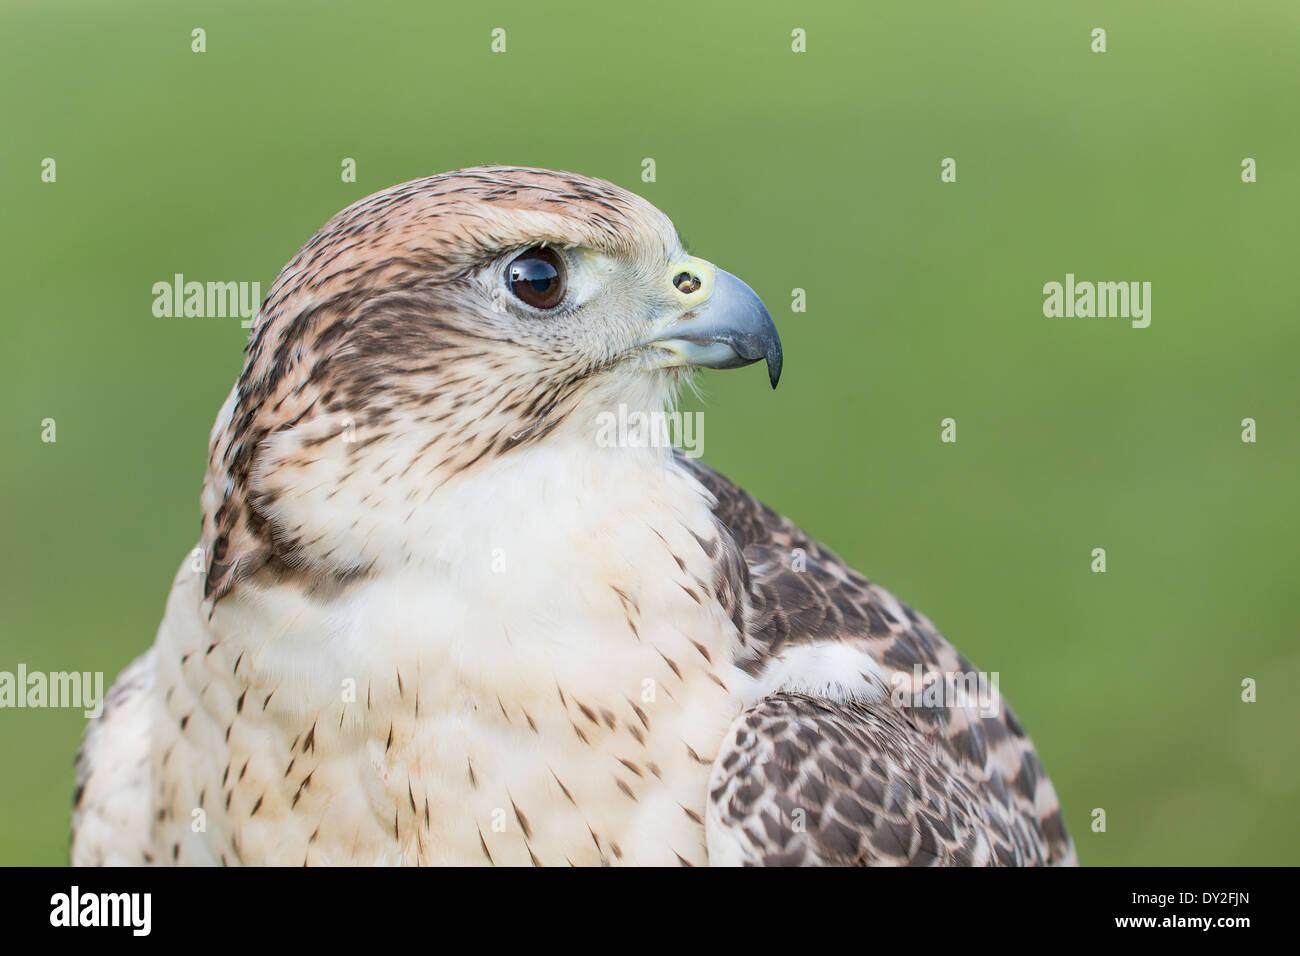 Portrait of a Saker Falcon (Falco cherrug) - Stock Image